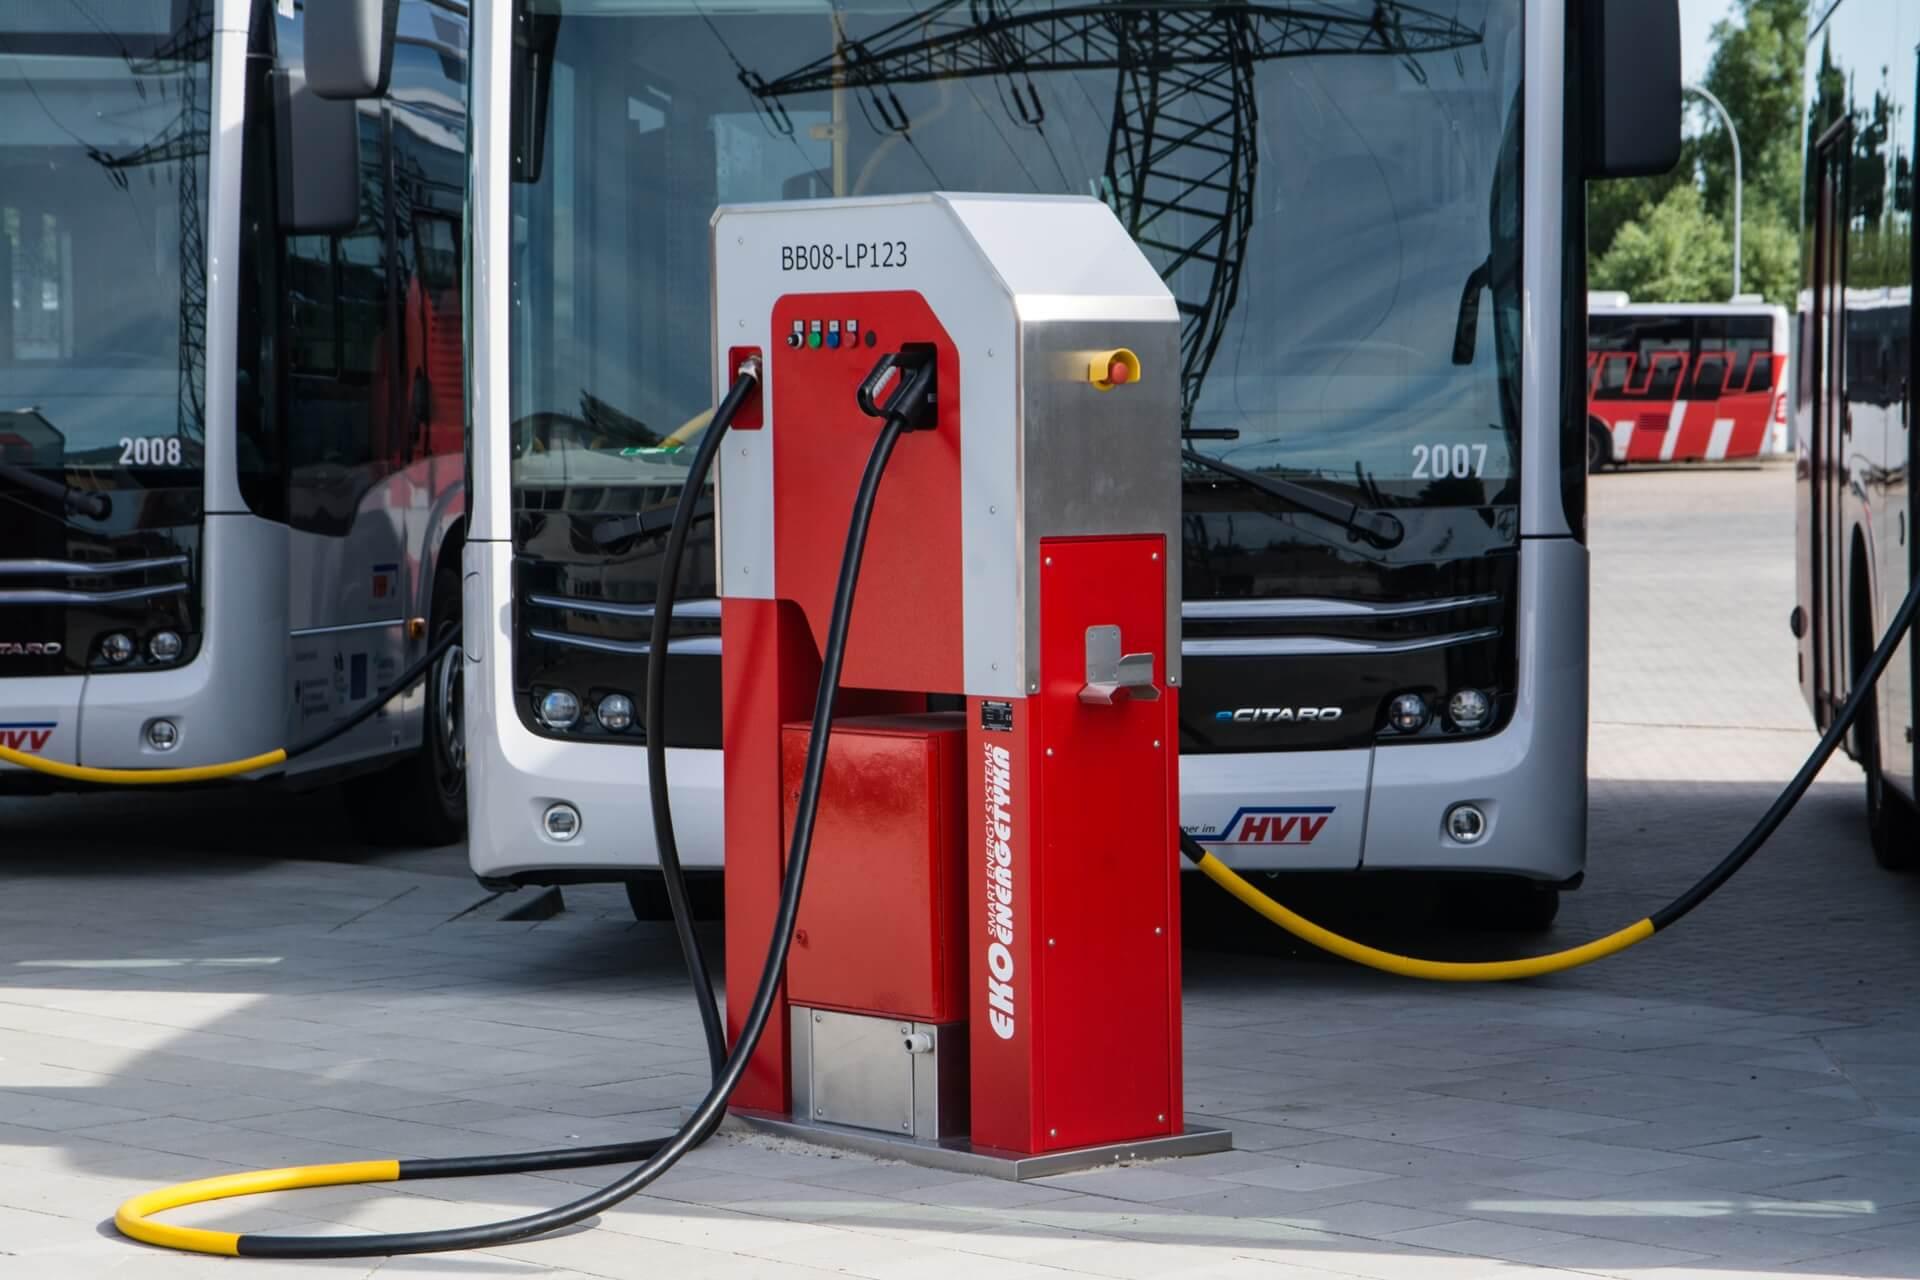 Ekoenergetyka-Polska implemented a globally innovative solution in Hamburg